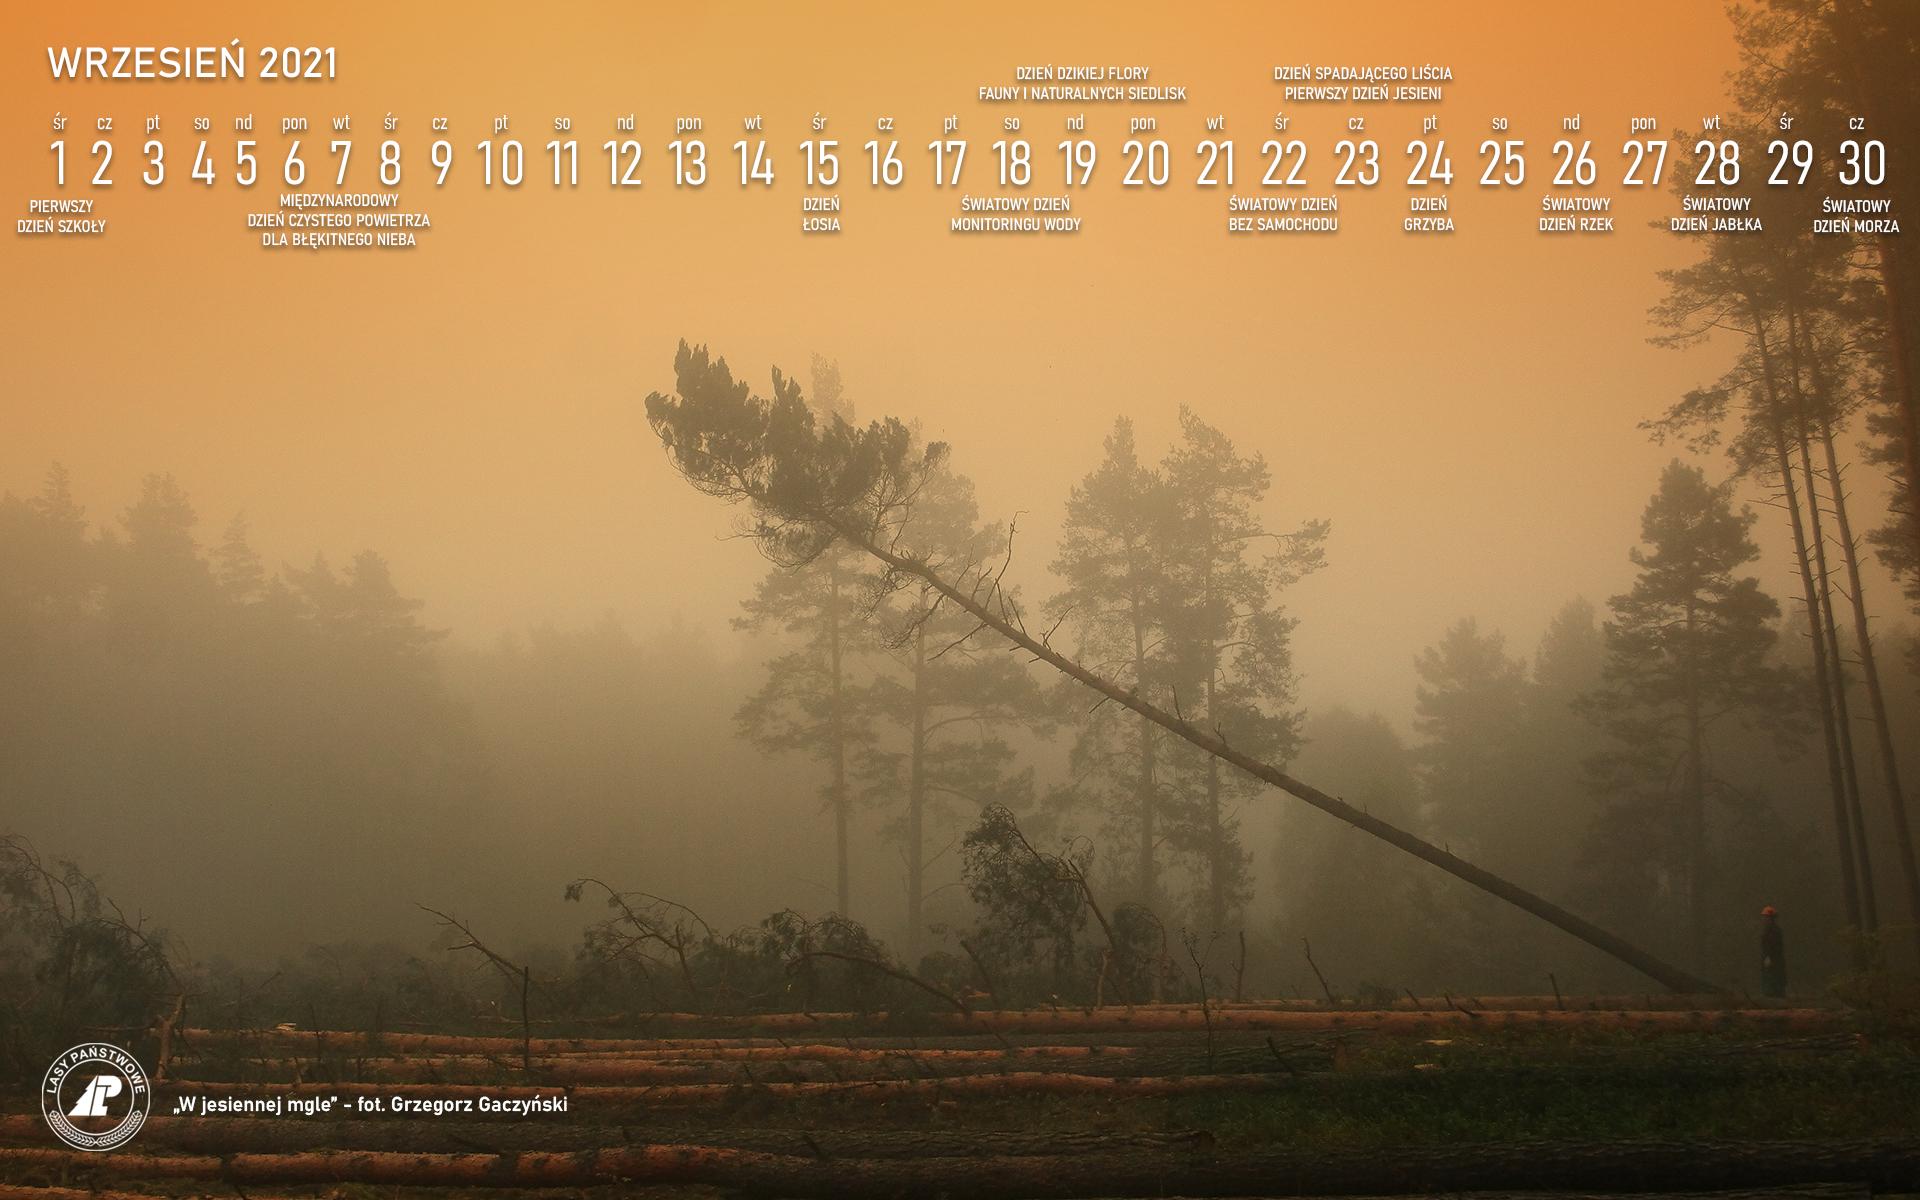 Kalendarz_wrzesień_2021_1920x1200[1].jpg